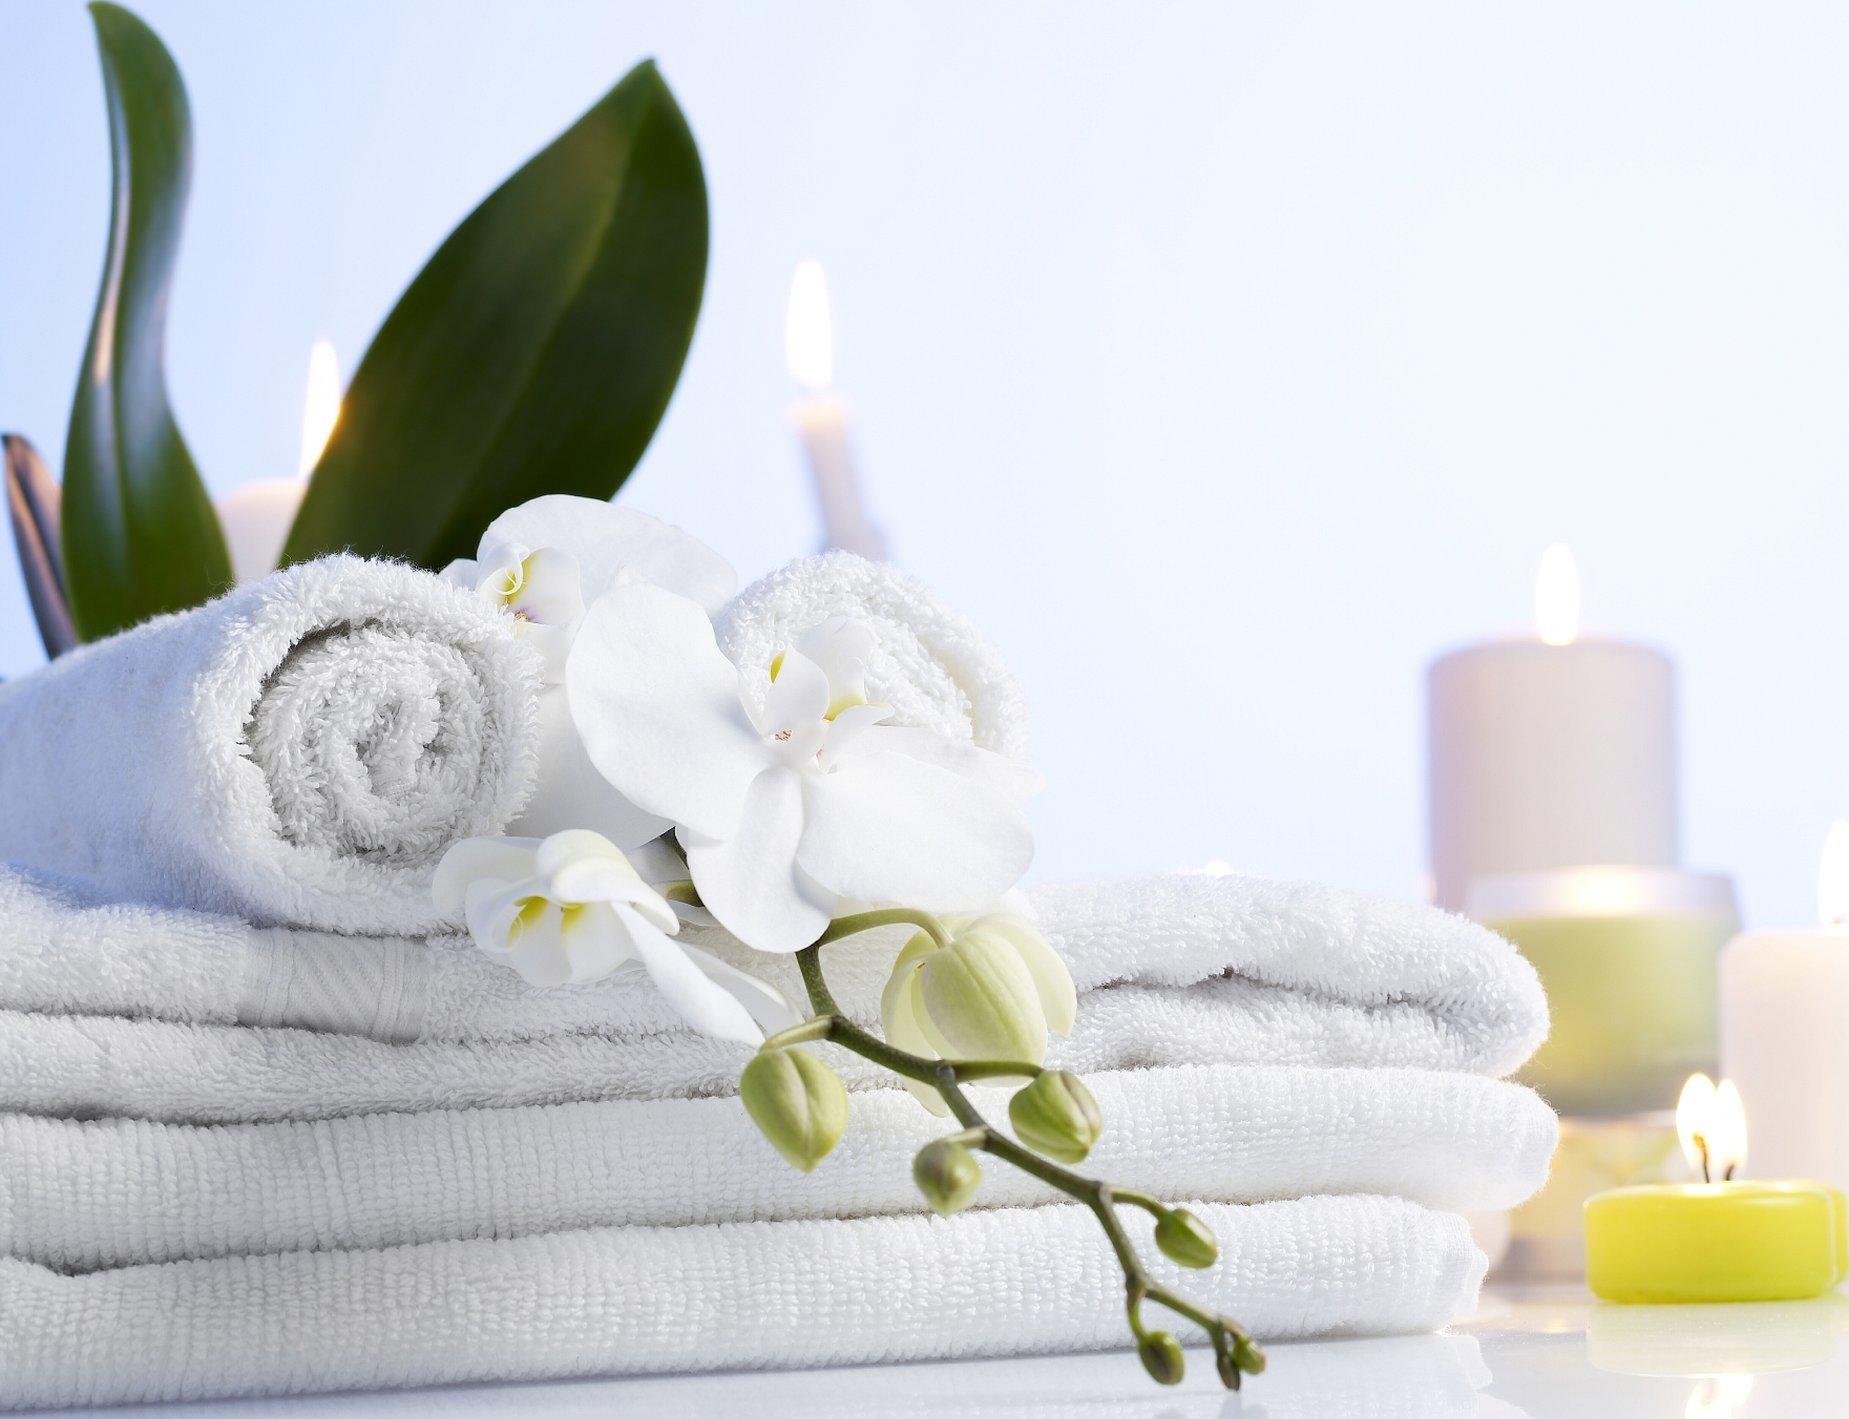 Спа полотенце сверху цветок белый